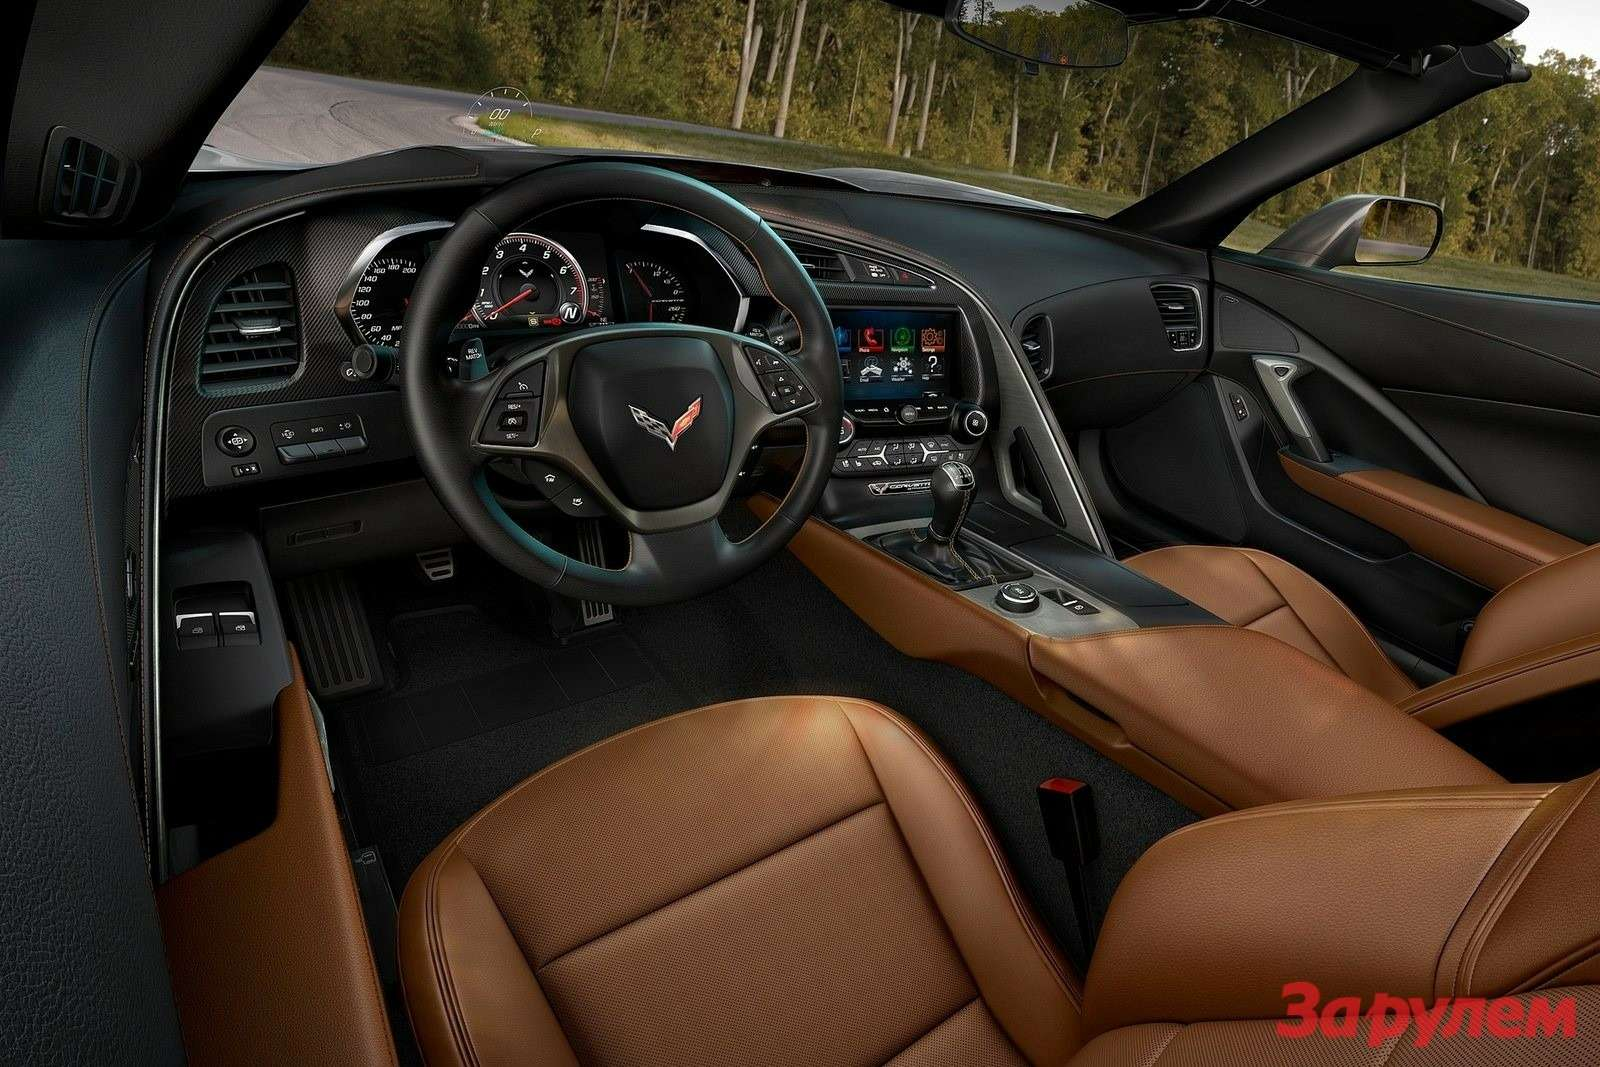 Chevrolet-Corvette_C7_Stingray_2014_1600x1200_wallpaper_17